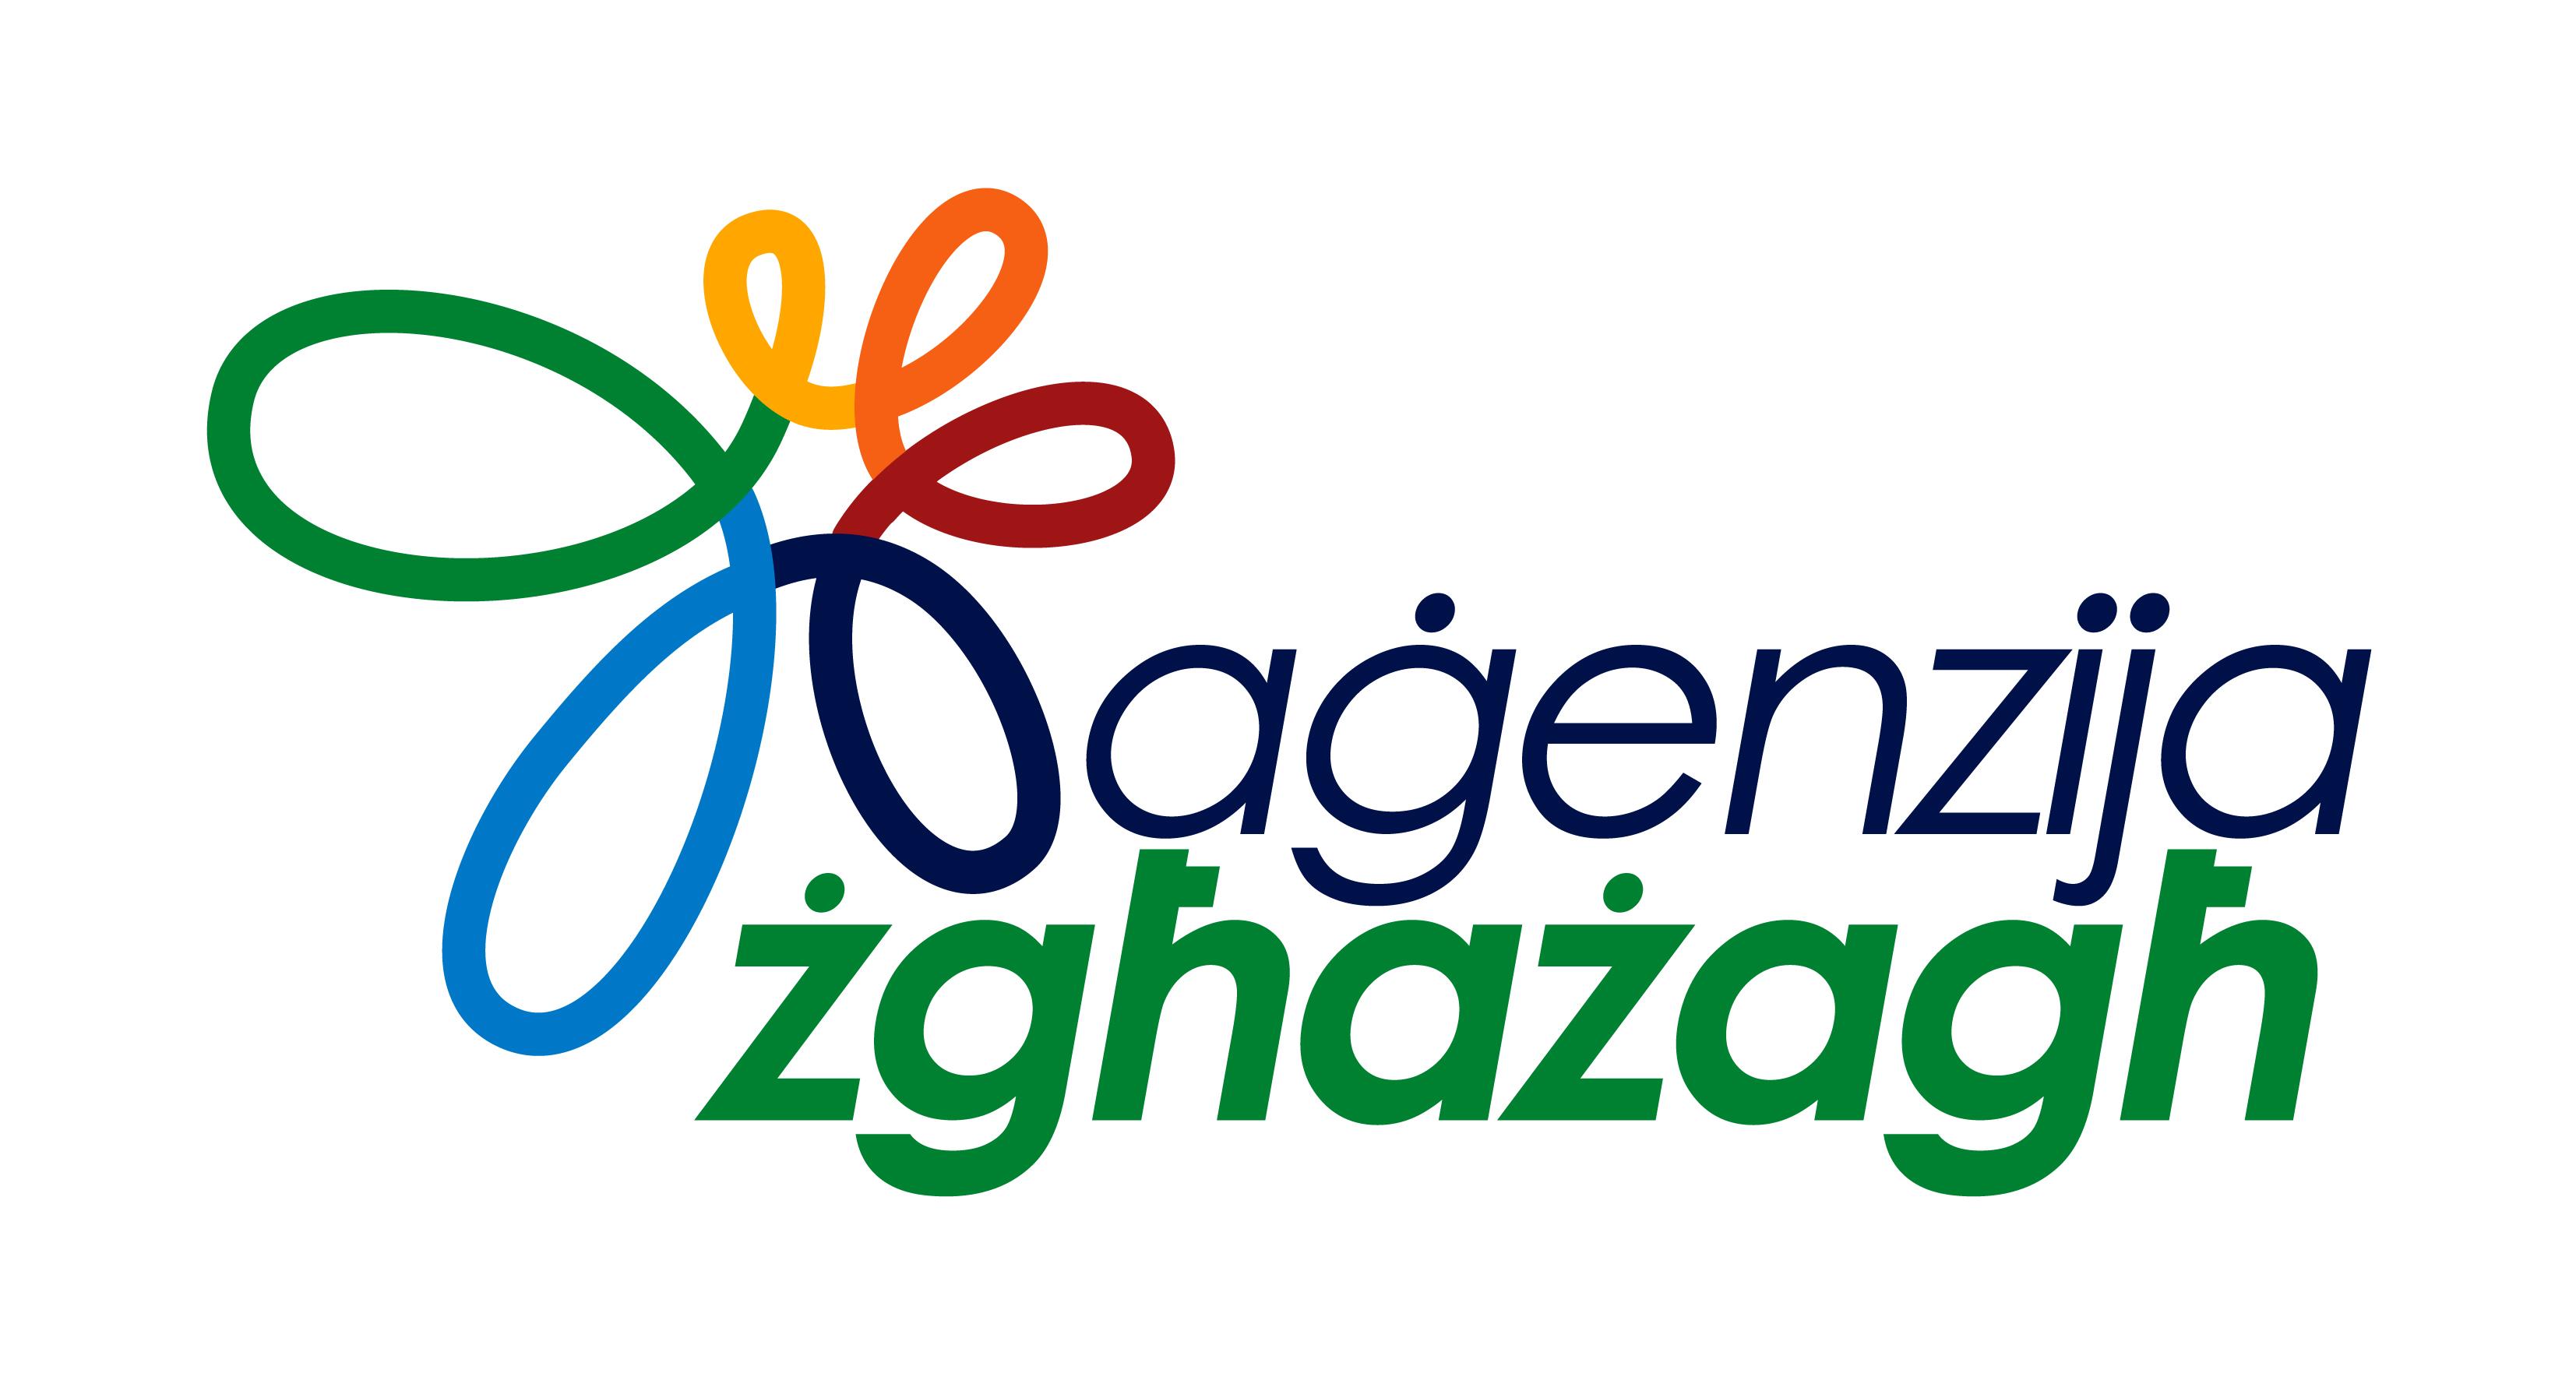 AngenzijaZghazagh logo